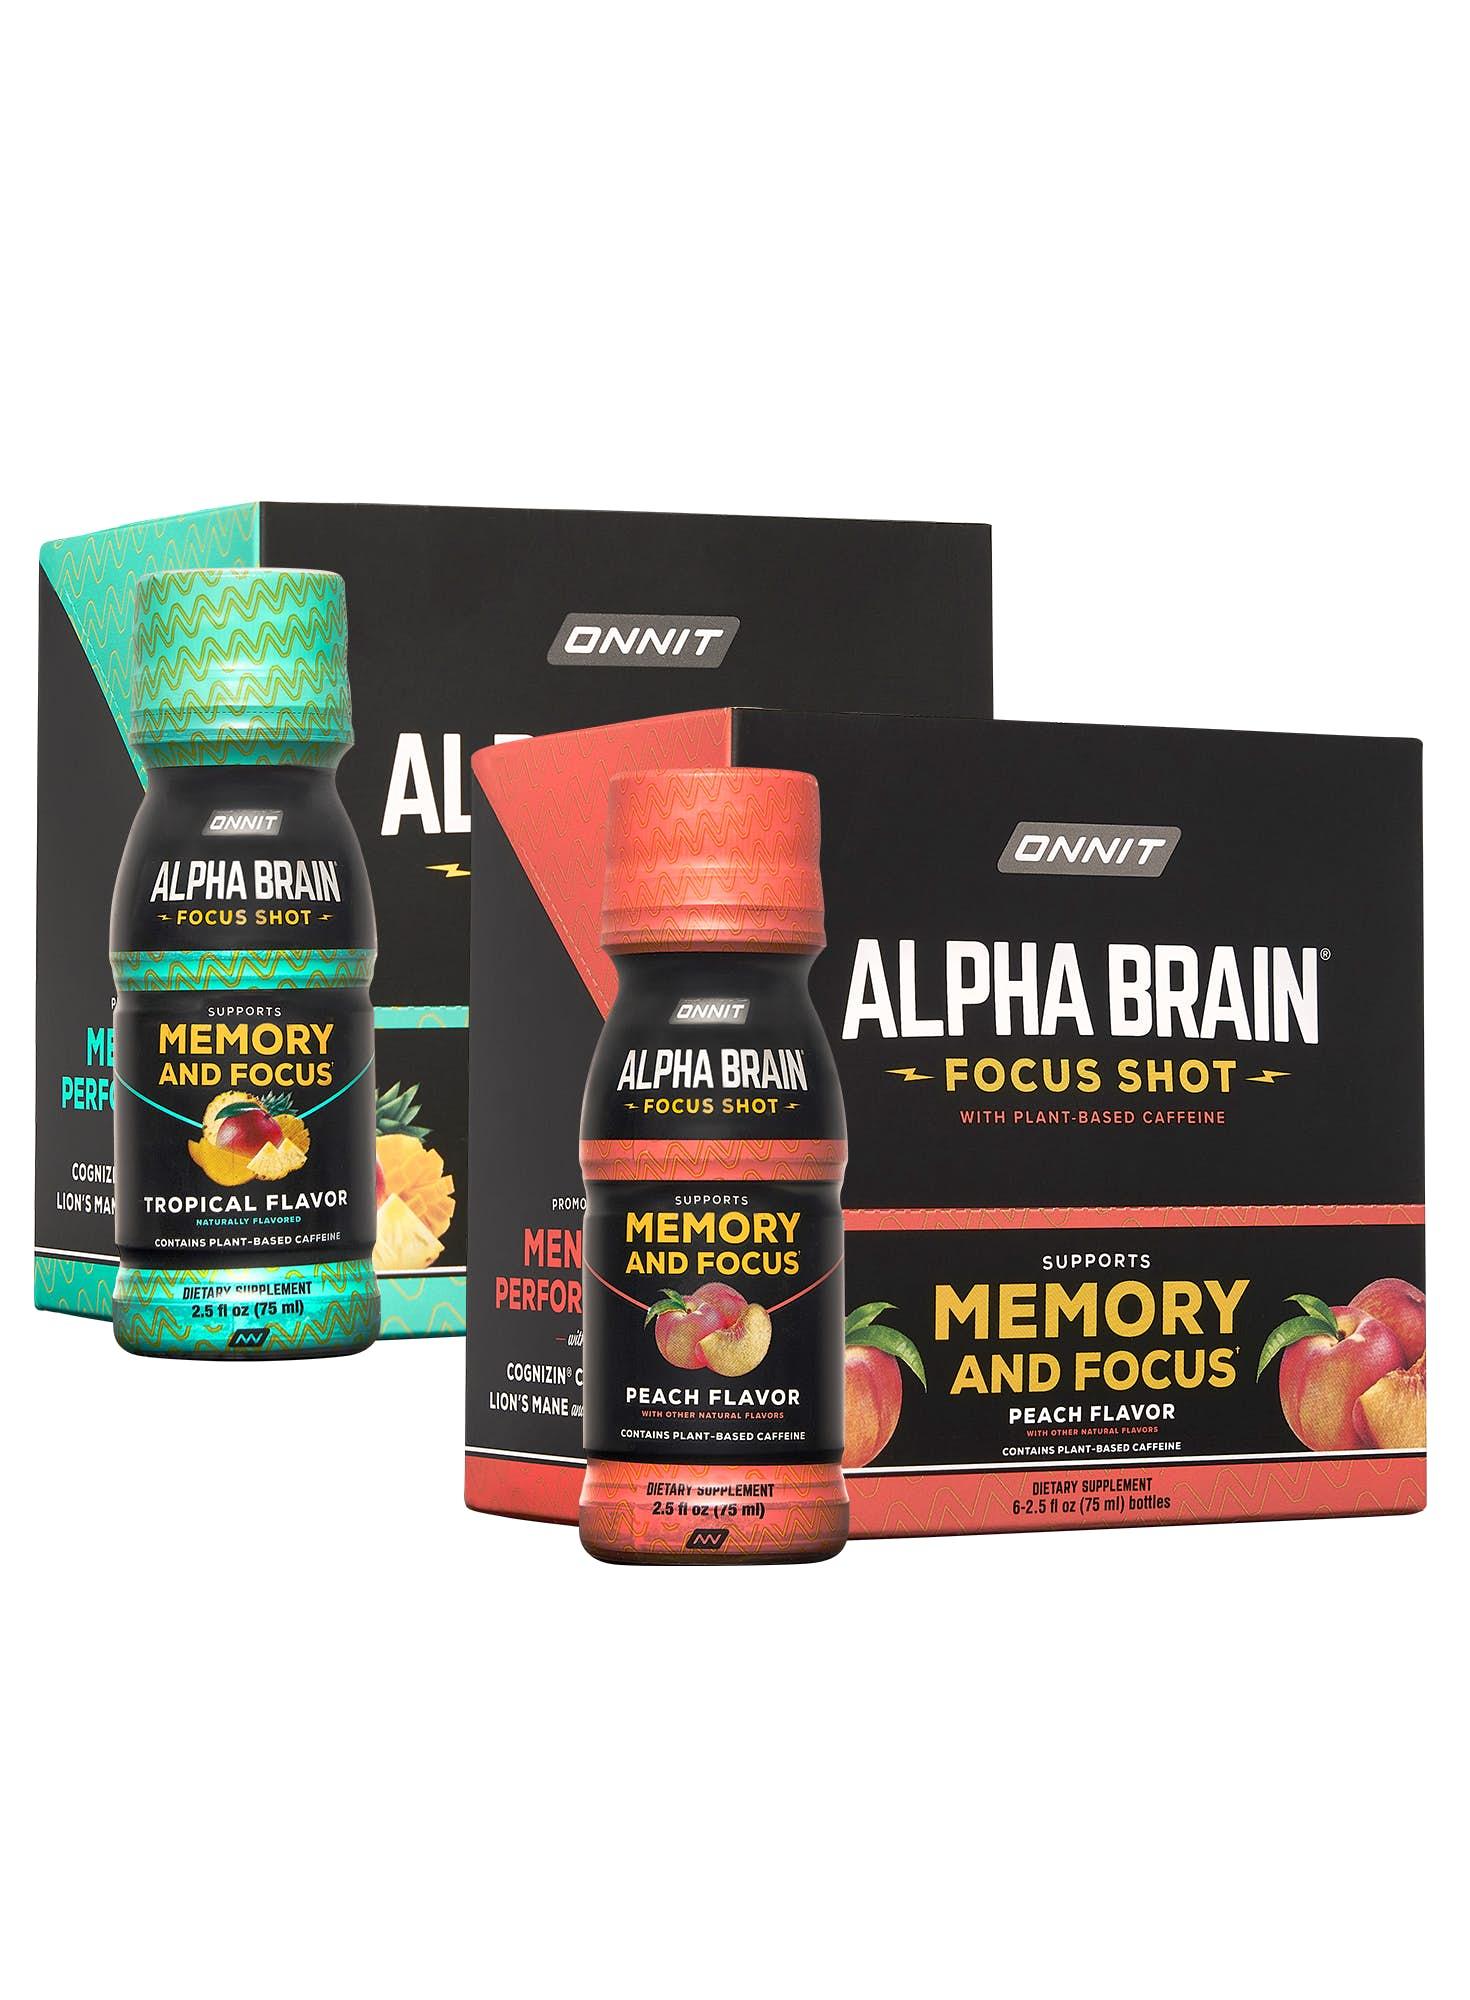 Alpha BRAIN® Focus Shot Now Available